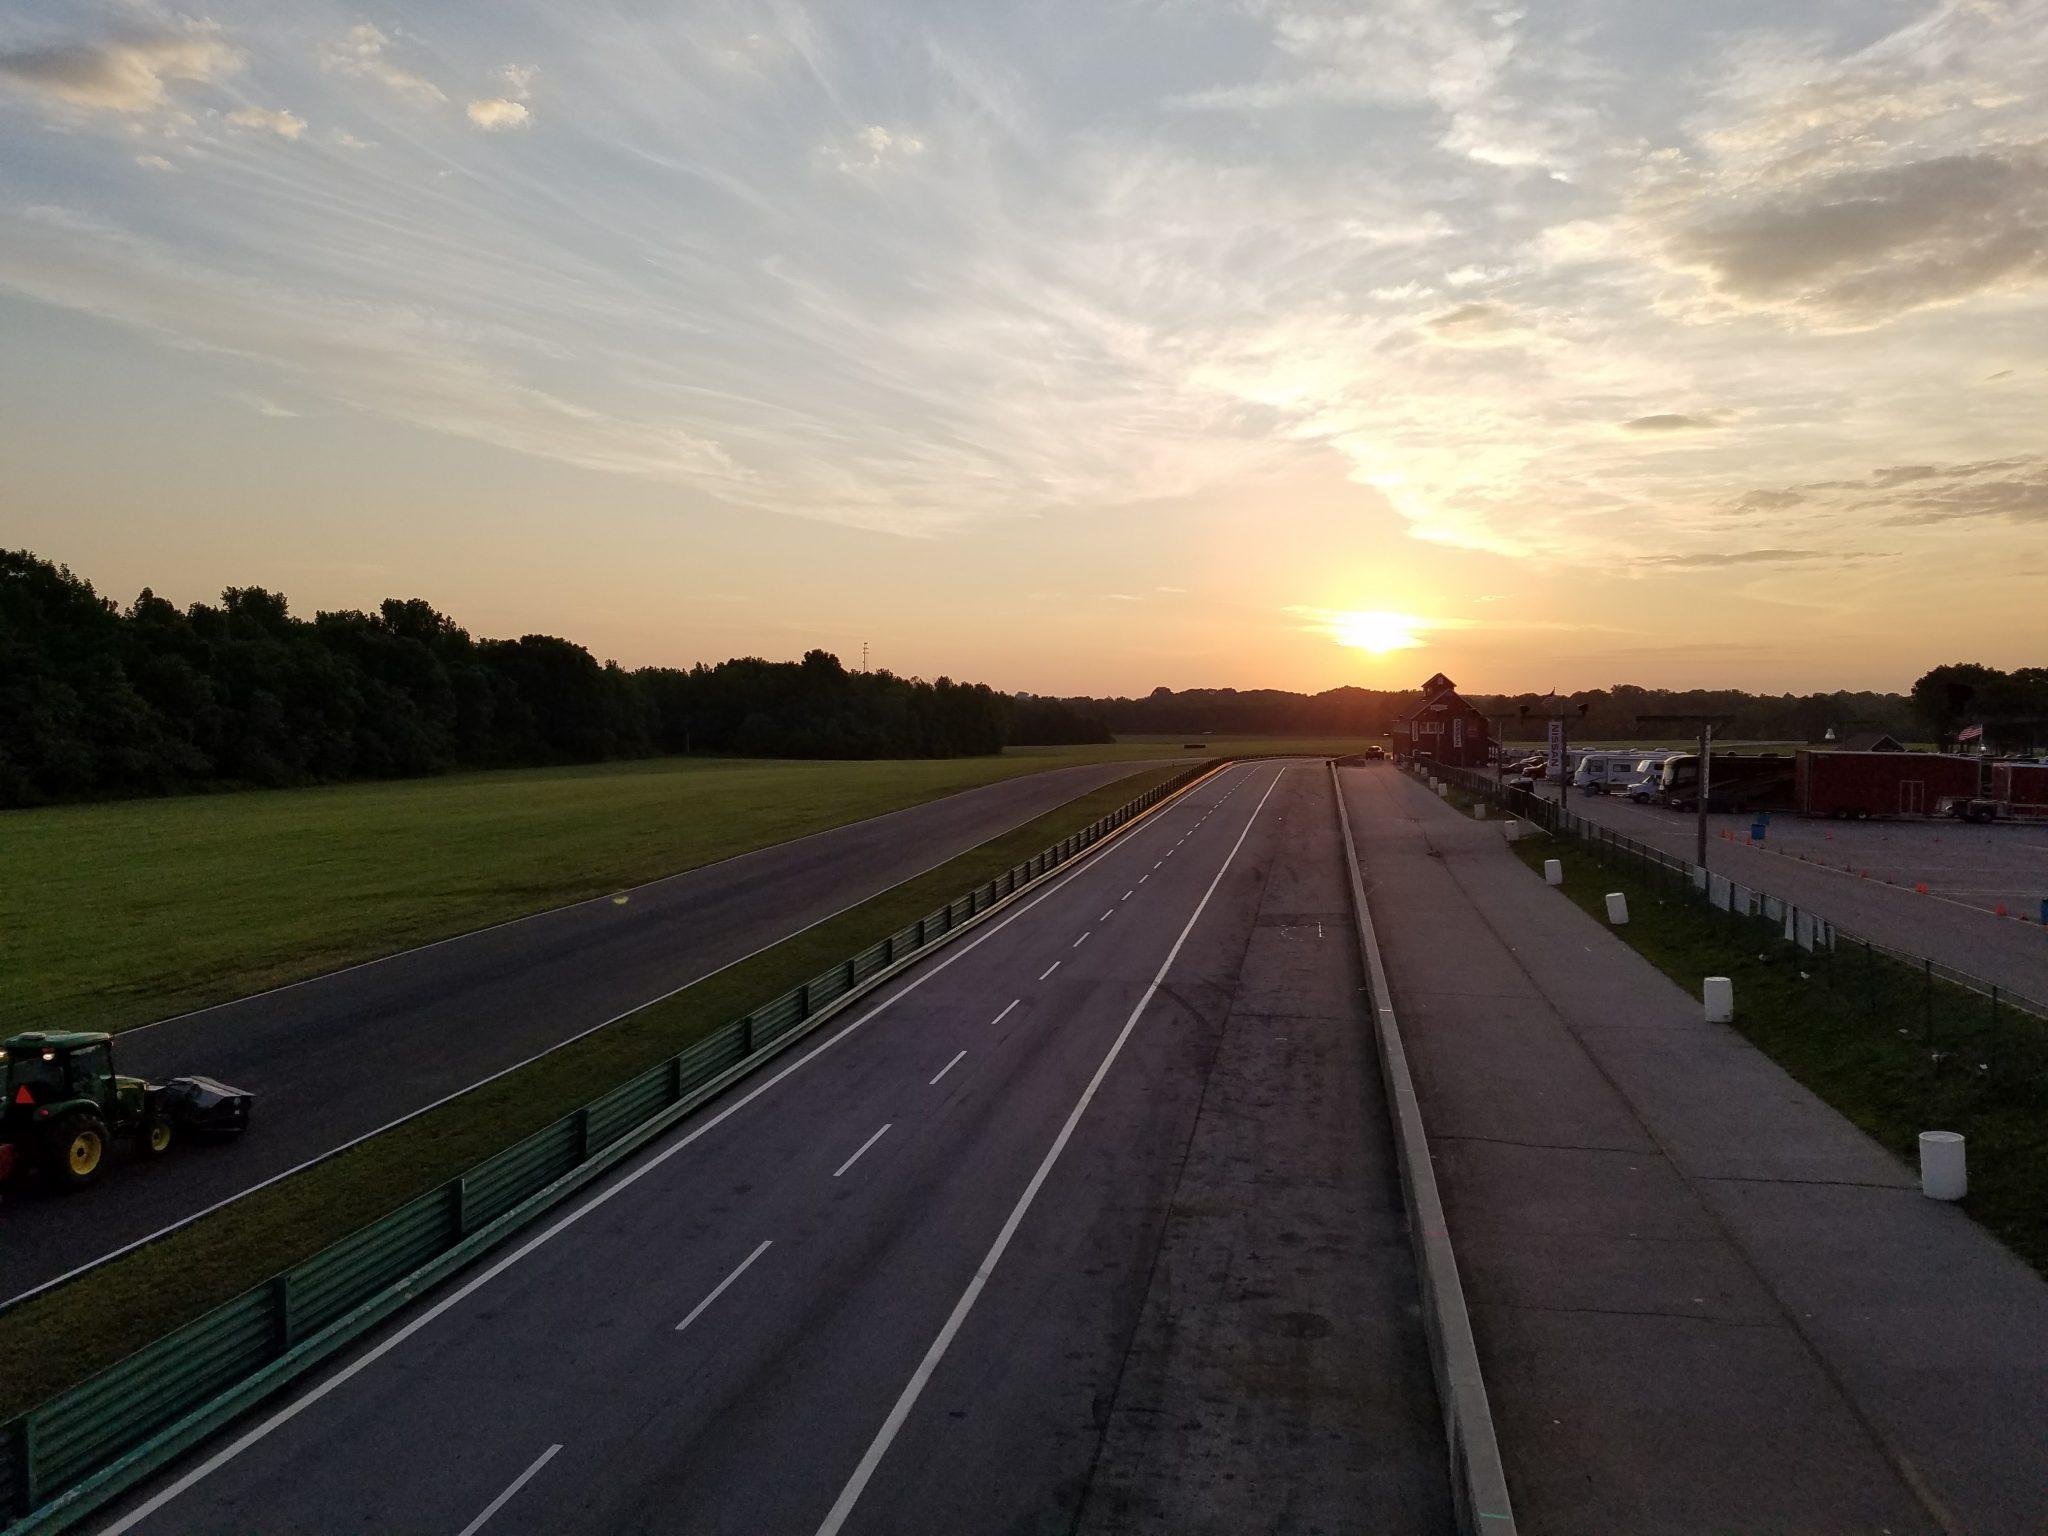 Sunrise over VIR